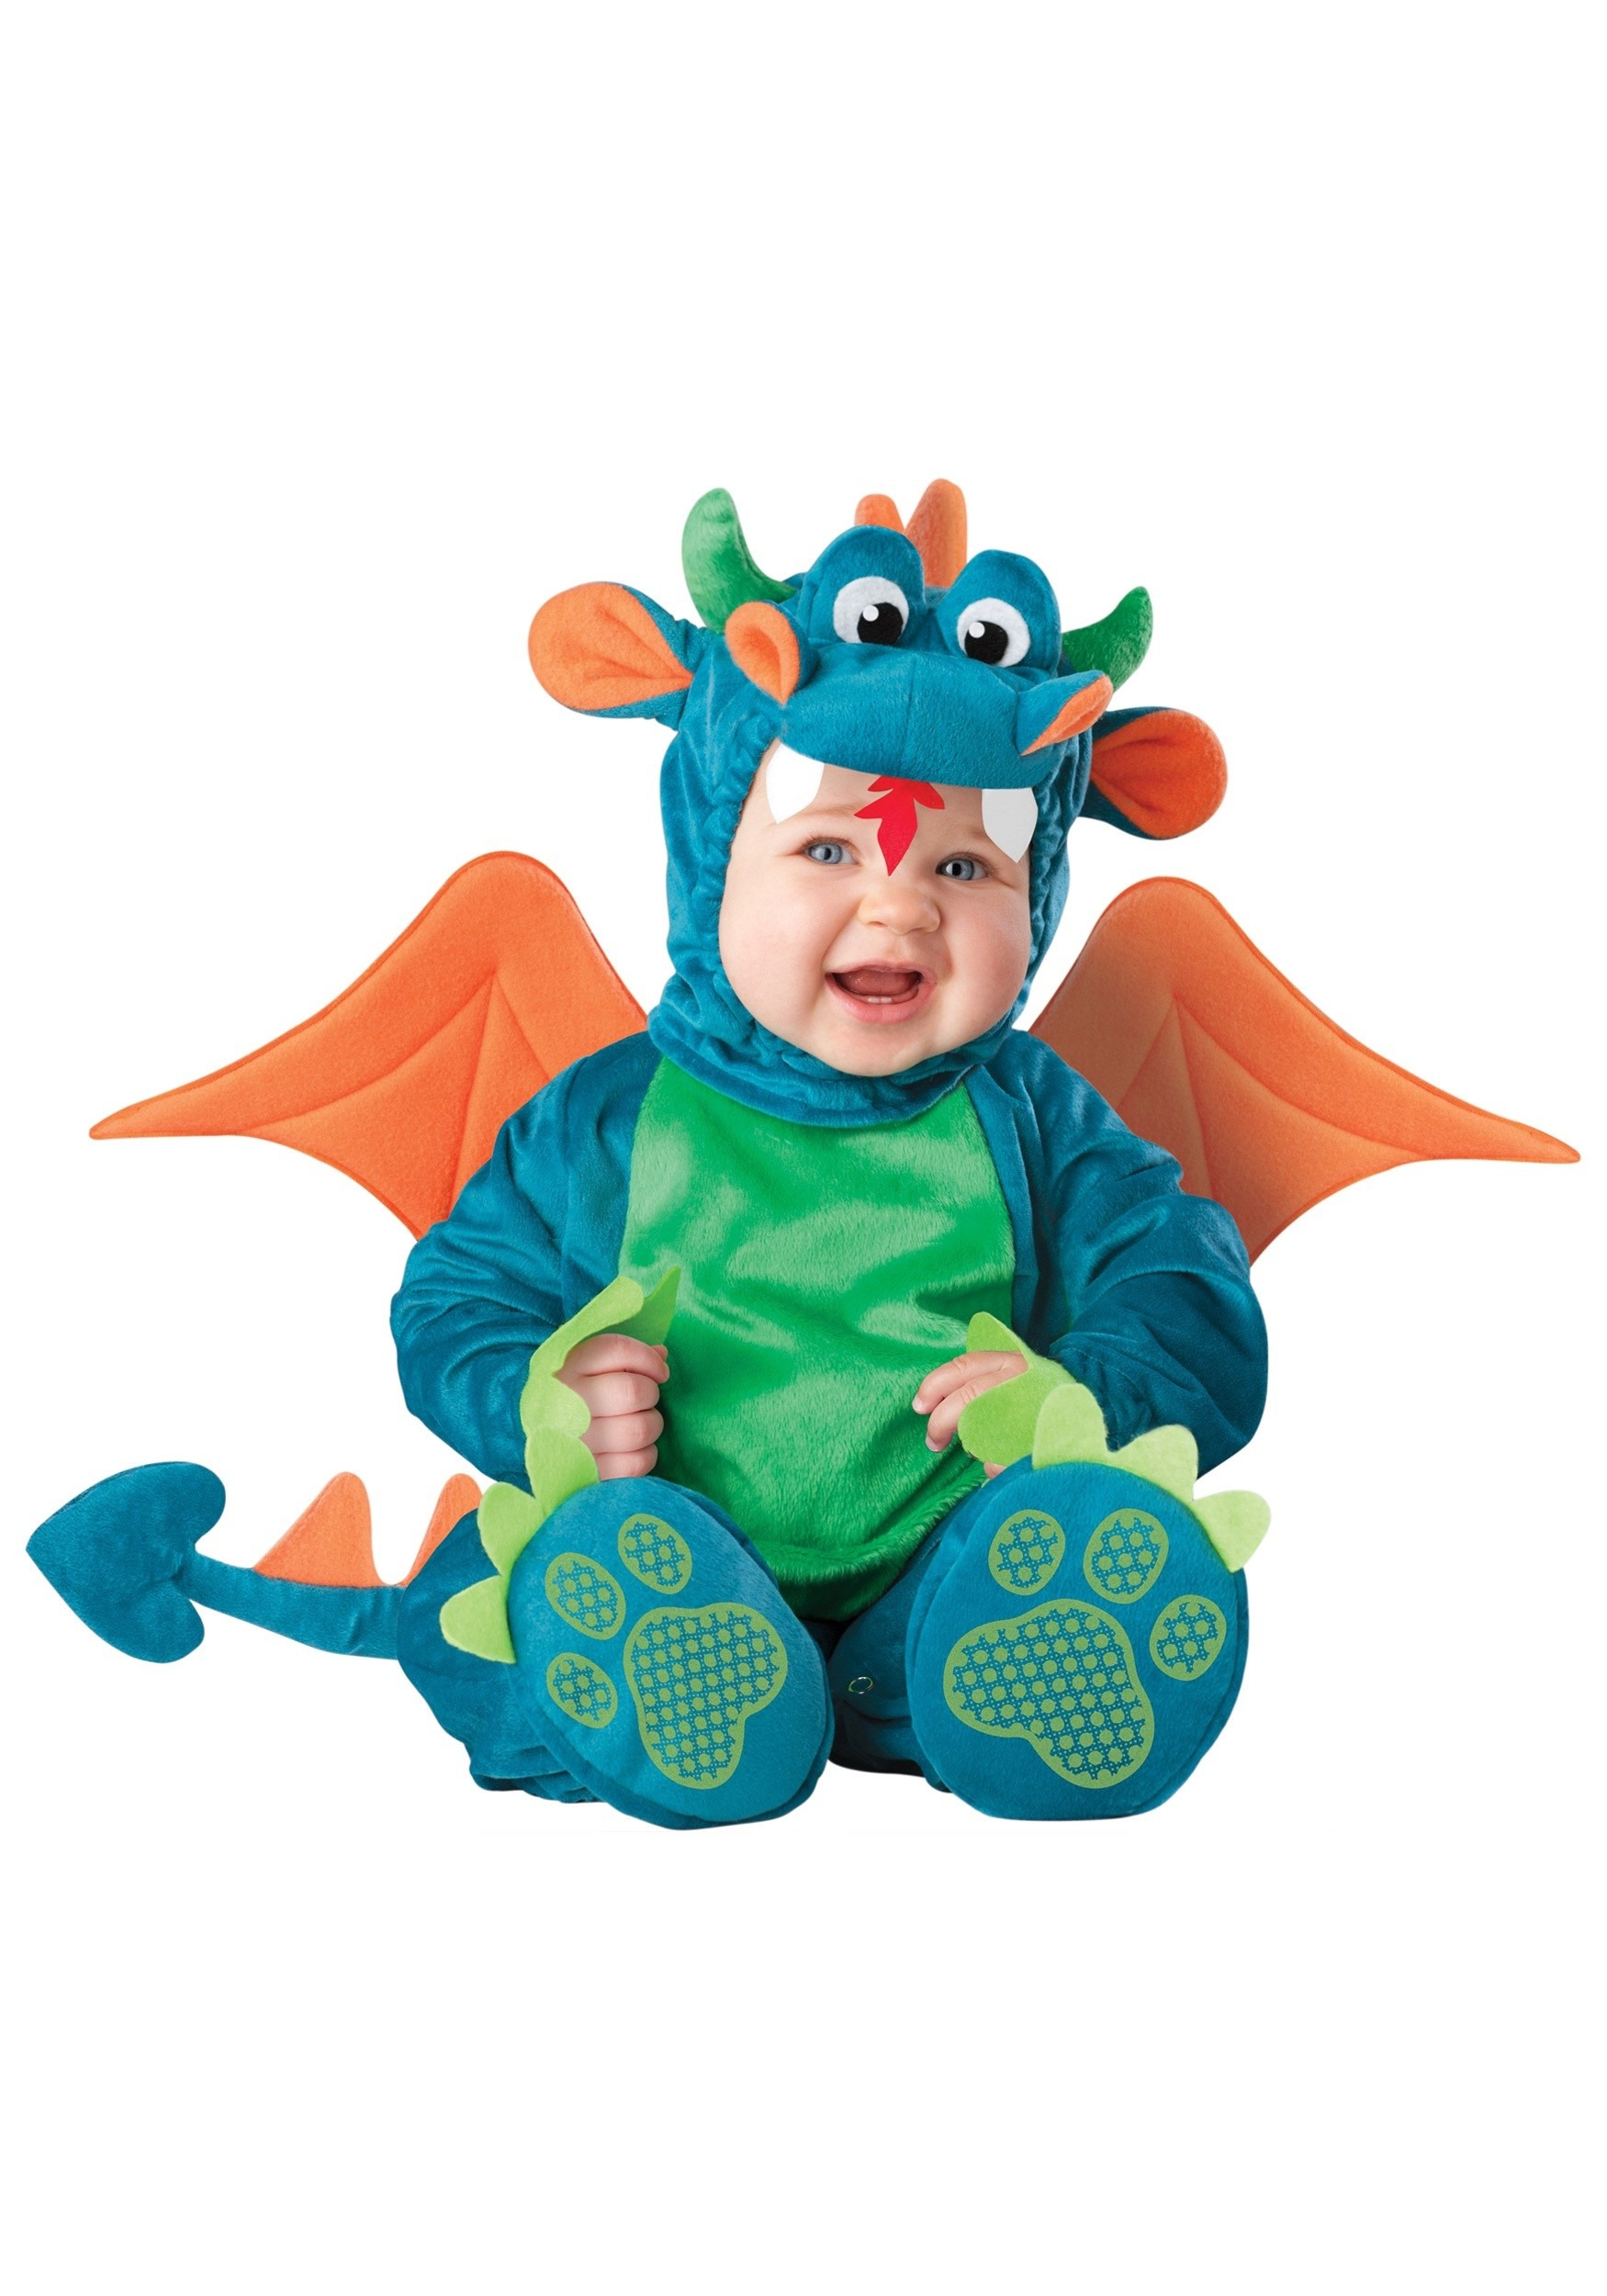 baby plush dragon costume - Dragon Toddler Halloween Costume